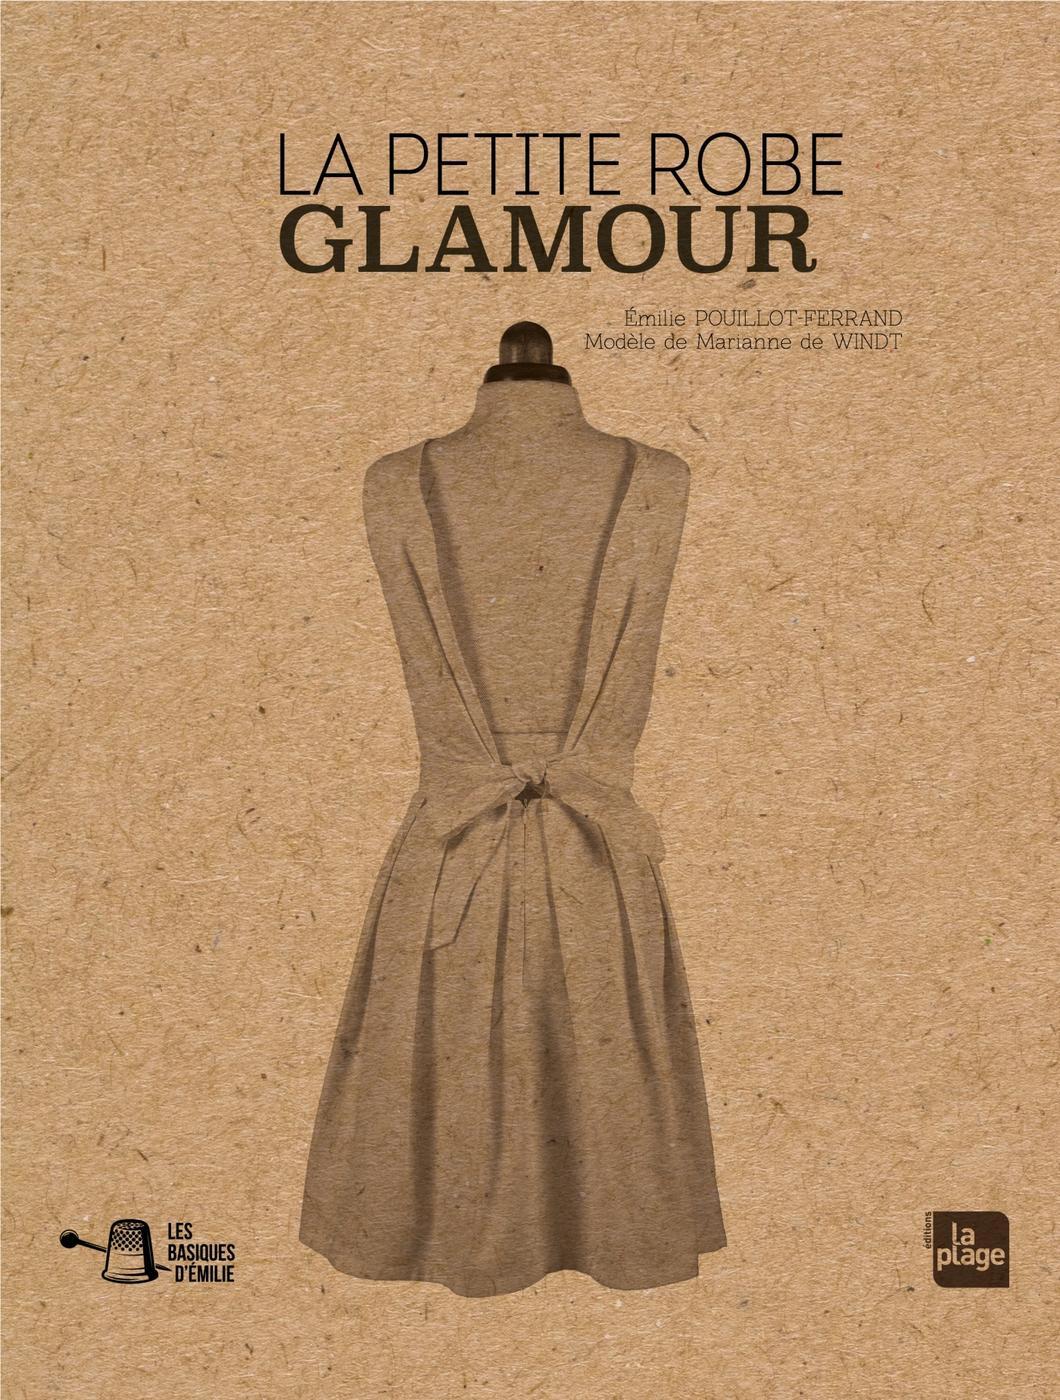 574f968fb6529 La petite robe glamour - E.Pouillot-Ferrand - Librairie Eyrolles